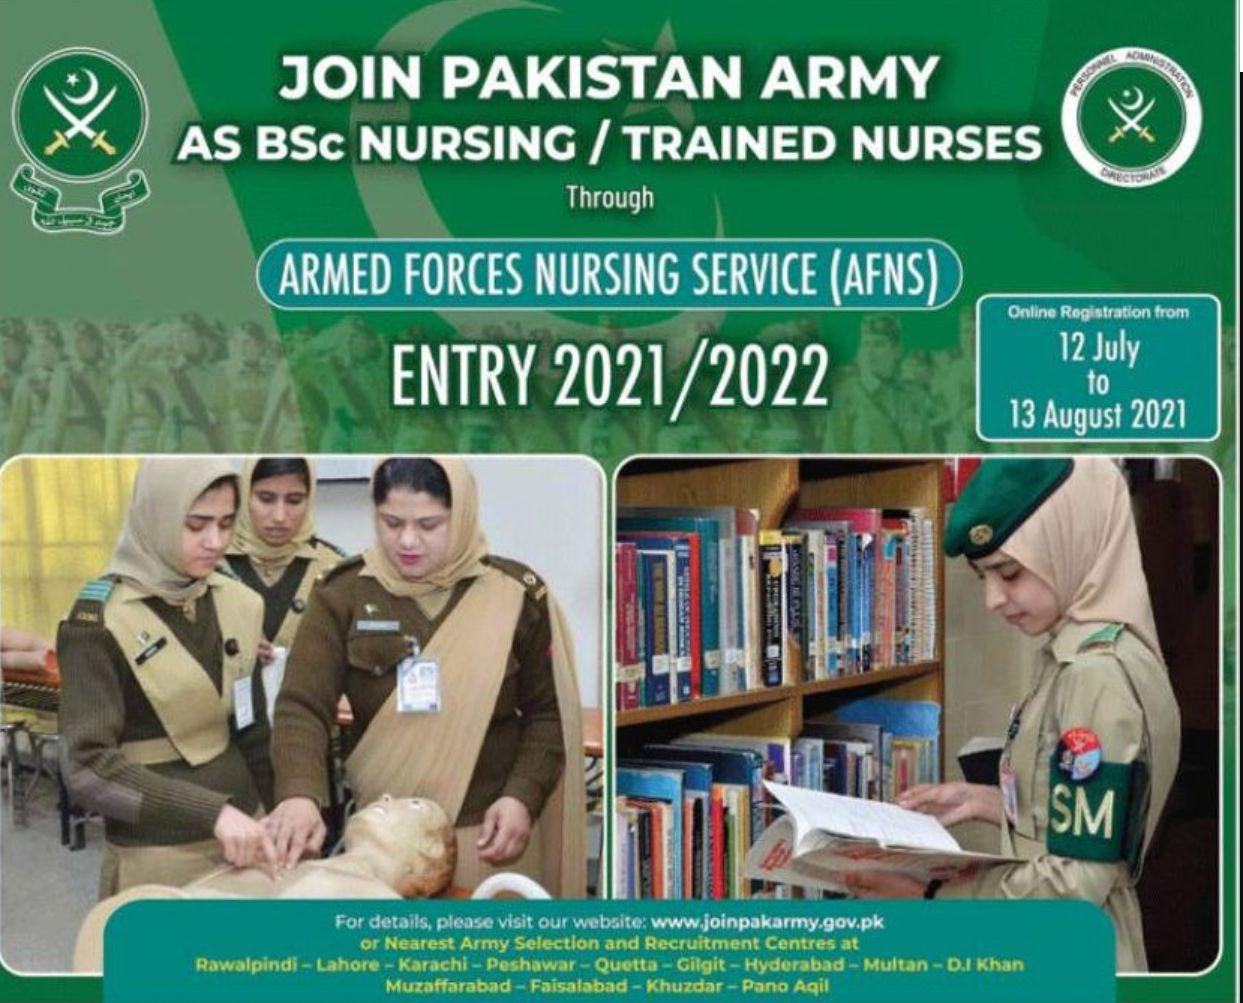 Join-Pakistan-Army-Jobs-2021-as-Nurse